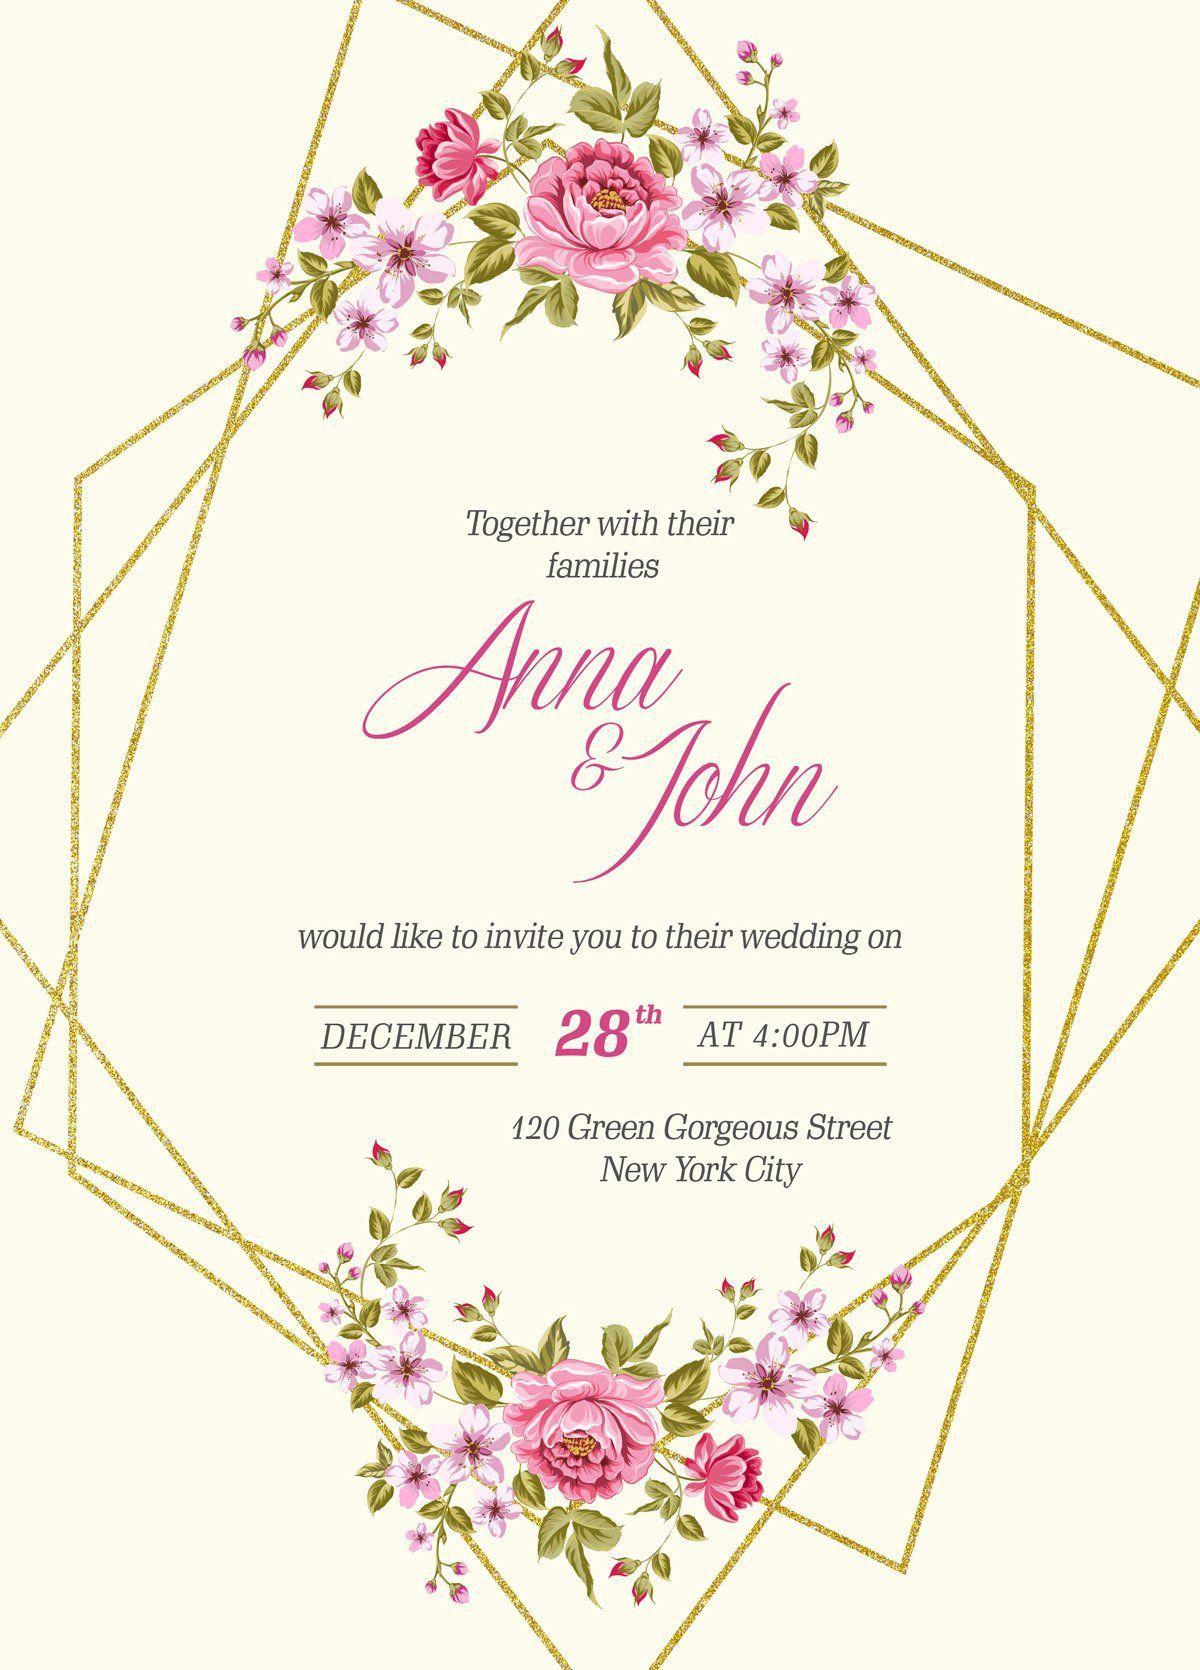 009 Stunning Wedding Invitation Card Template High Def  Design In Marathi Marriage Sample For Hindu Format TamilFull